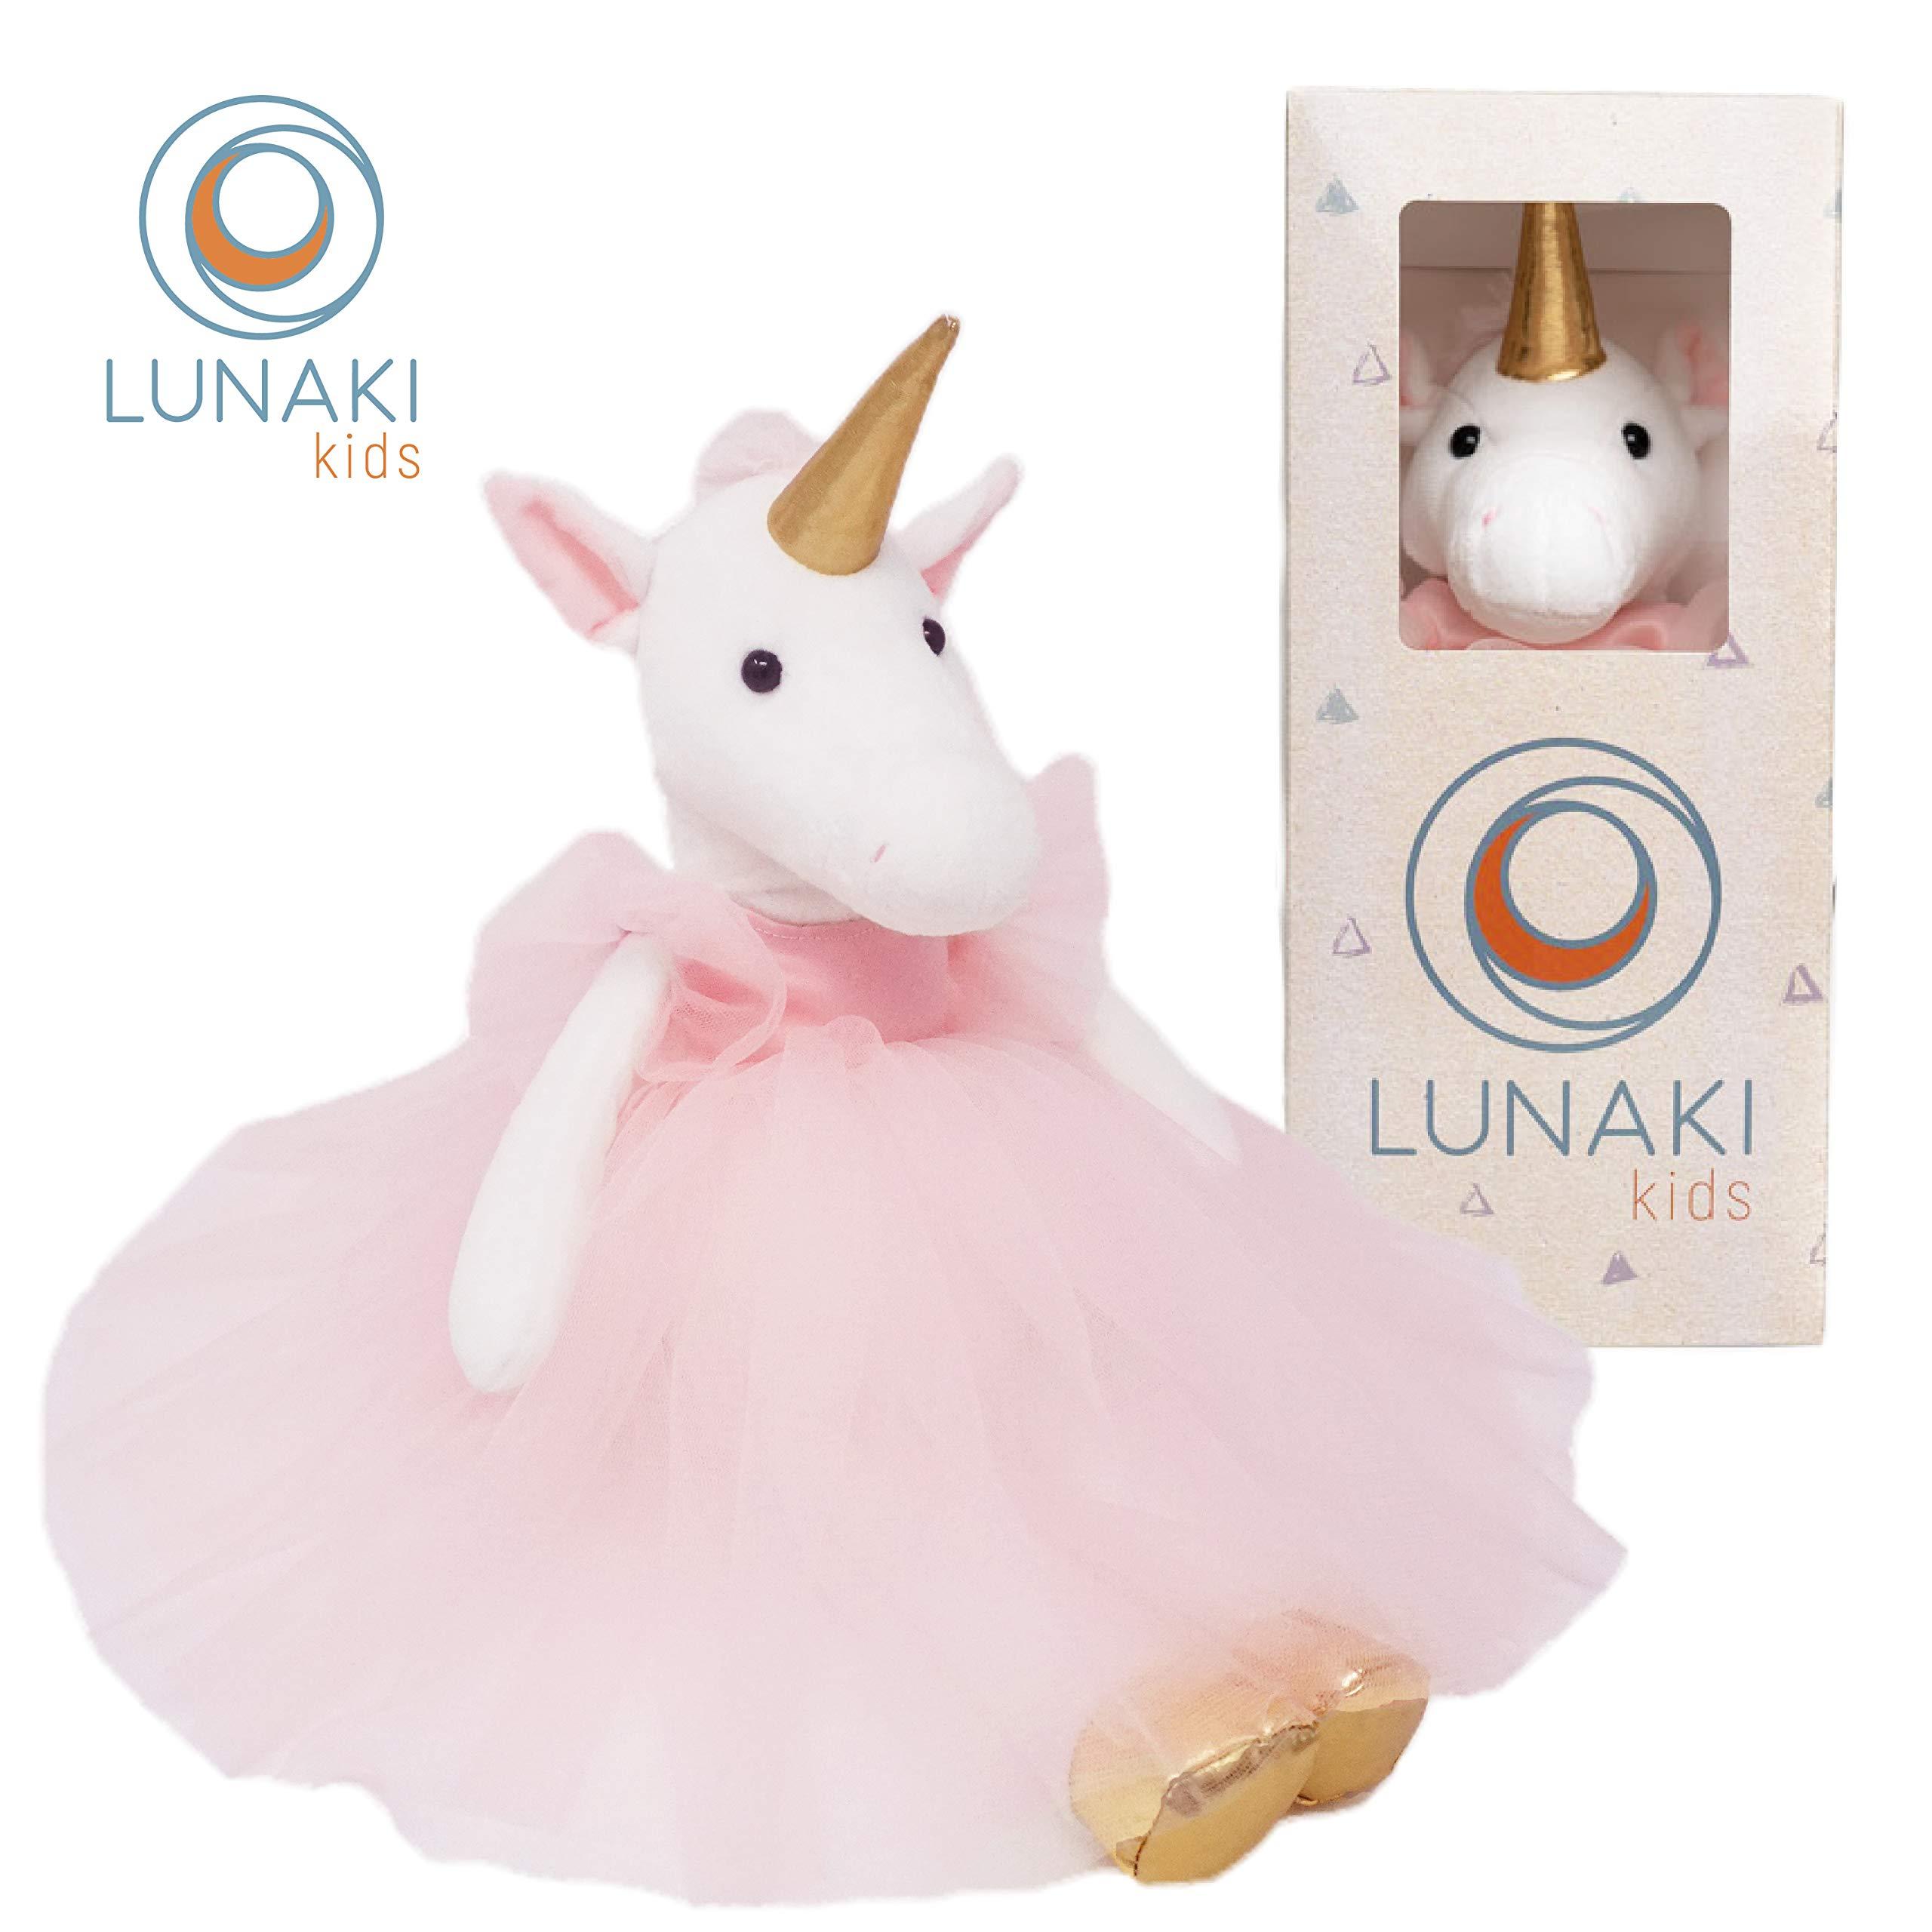 Lunaki Unicorn Stuffed Animal Plush Toy in Pink Tutu Dress - Premium Gift for Girls, Great Unicorns Toys for Birthday, Baby Shower & Christmas - 19 inches by Lunaki